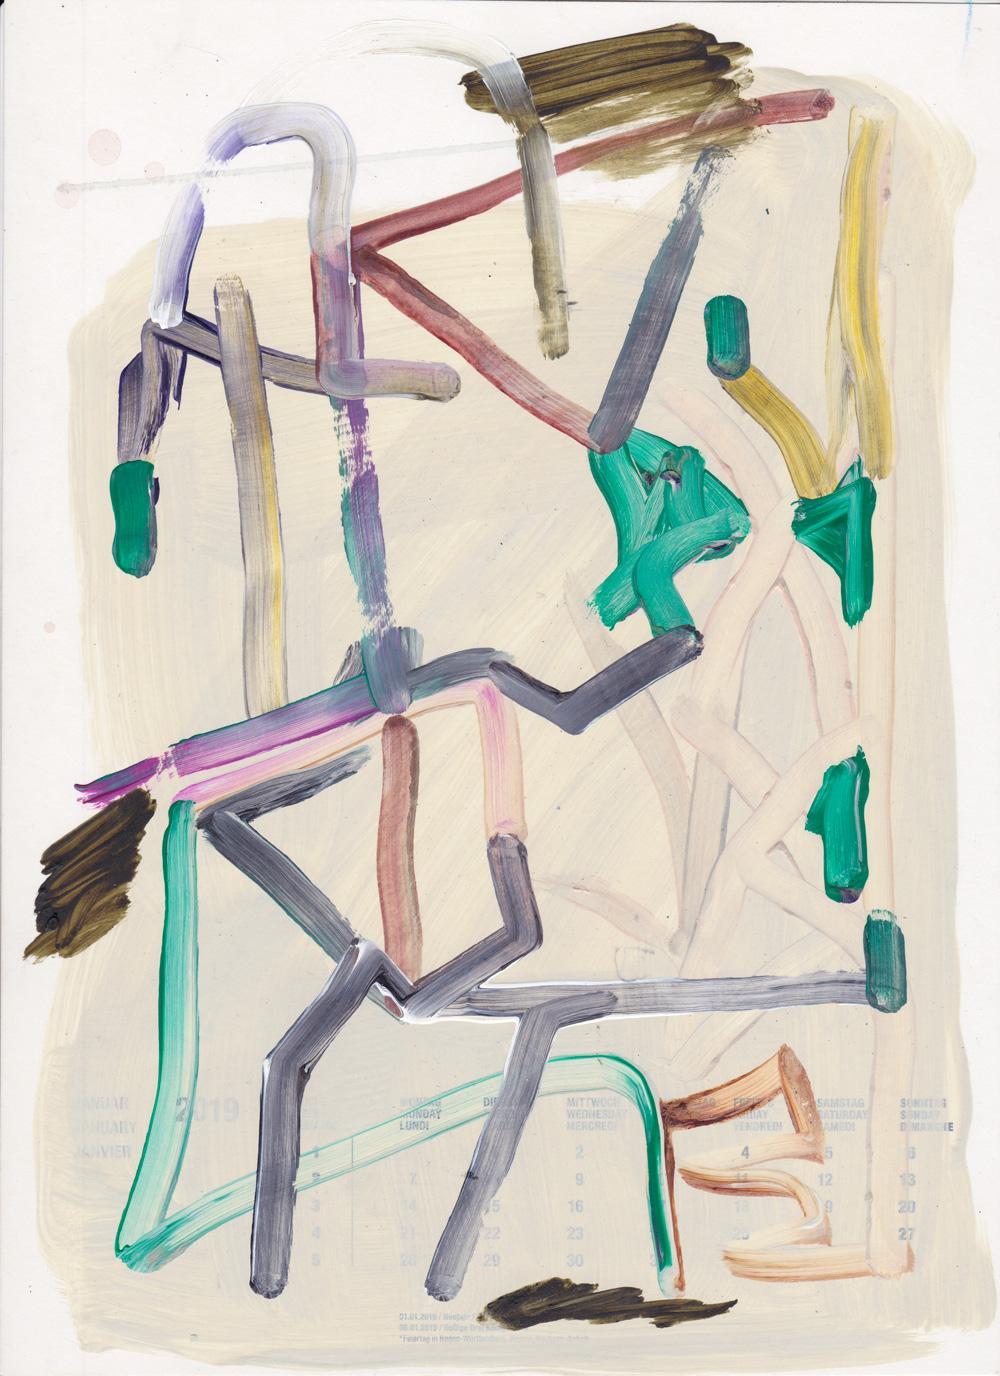 2020-05-DA-Painting-TrialandError-Scan600dpi-web